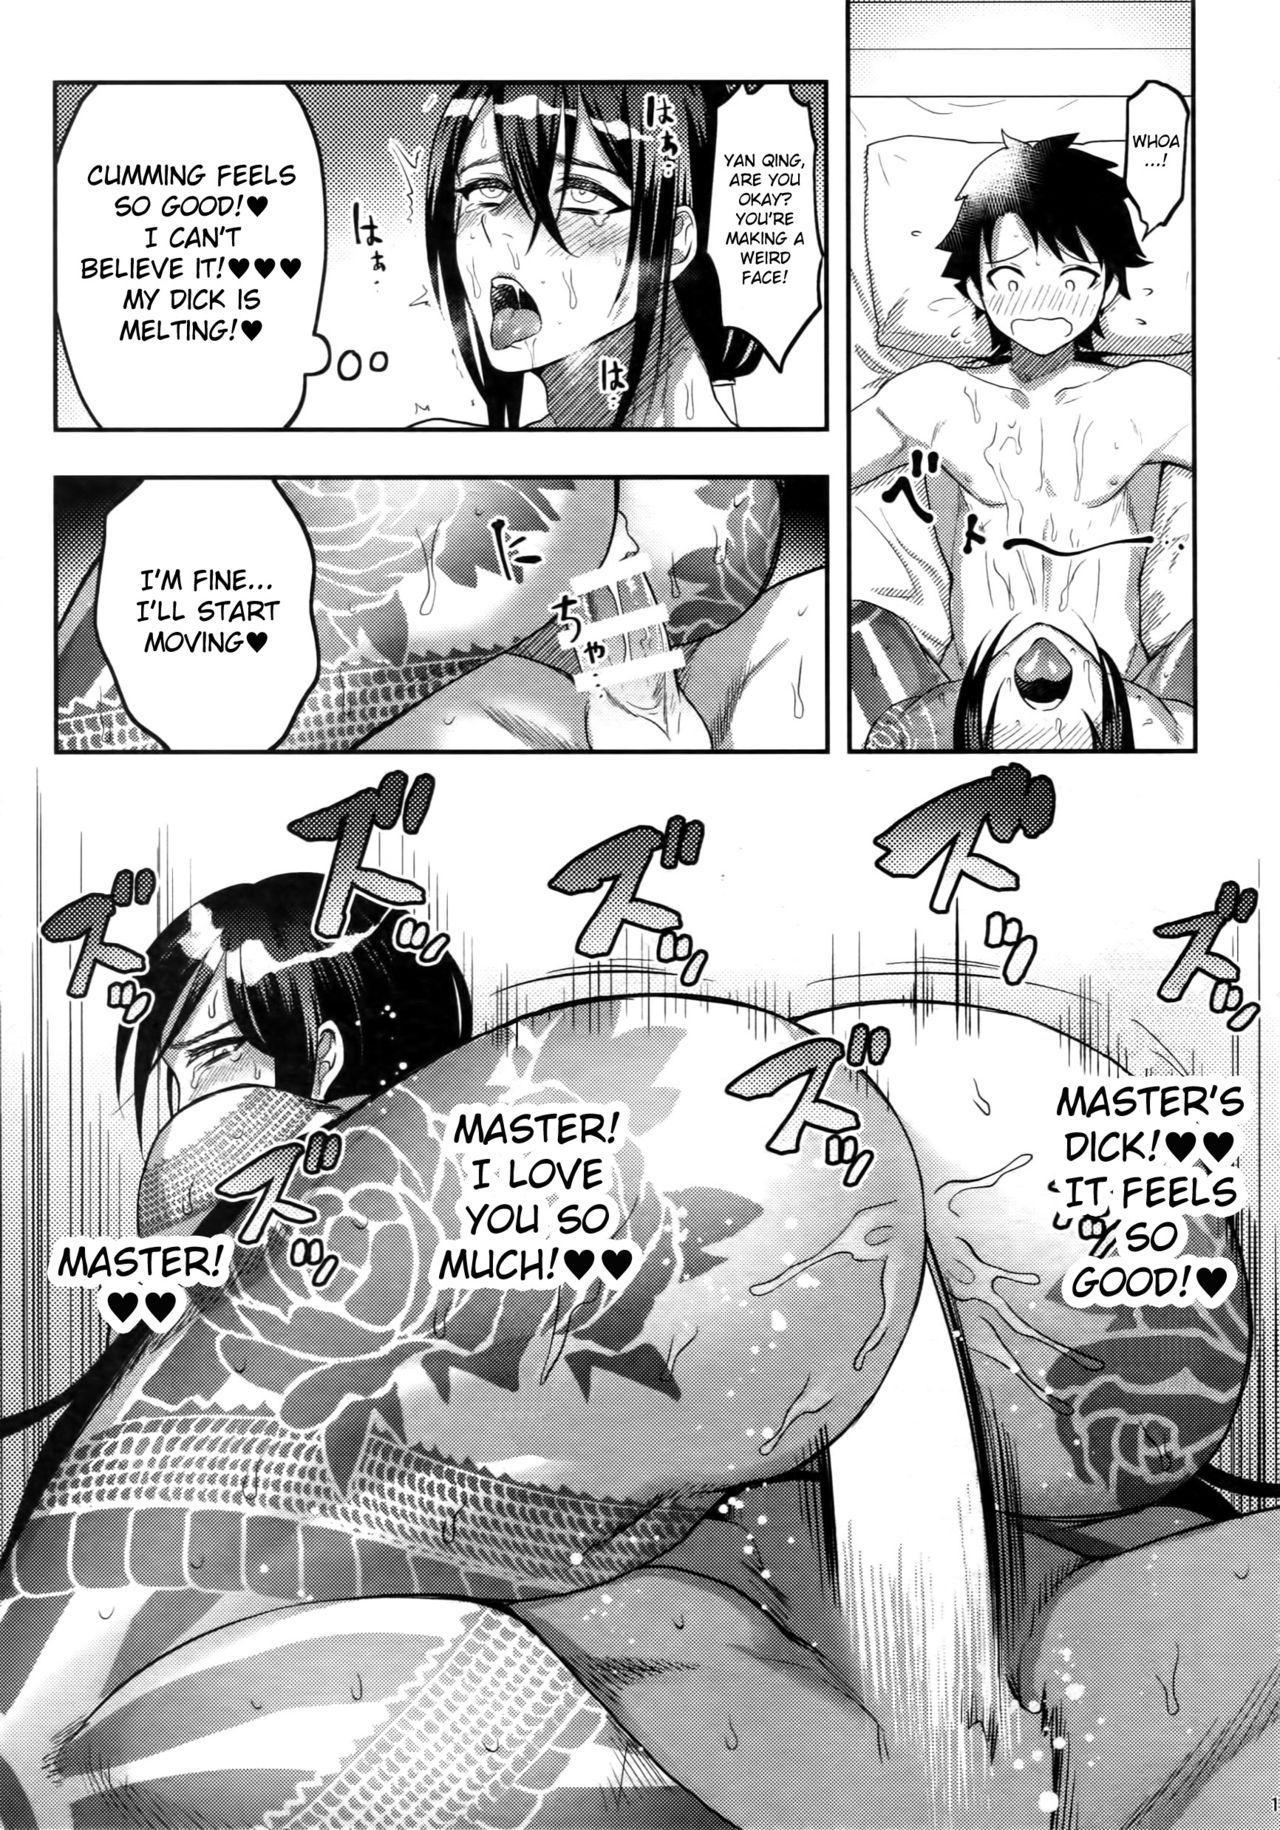 (Super ROOT 4 to 5 2019) [xxkorori (Ko Tora)] Kando 500-bai Yami no Kyoukaku Nonstop Namahame 24-ji | 500-times Enhanced 24-hour Nonstop Raw Sex Session with the Guest of Darkness (Fate/Grand Order) [English] [MintVoid] 14